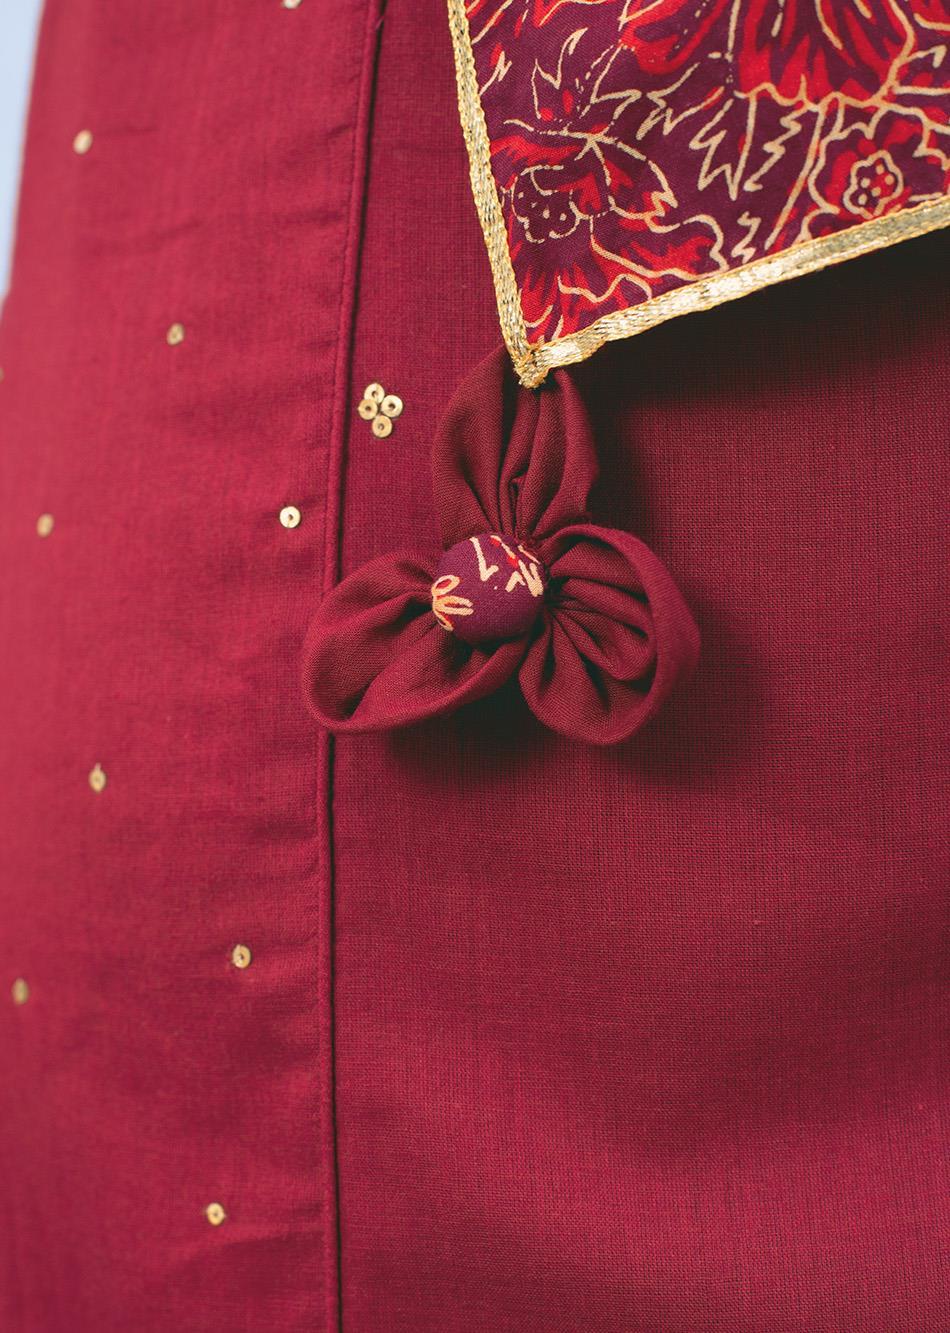 Gold printed beautiful Dupatta By Jovi Fashion